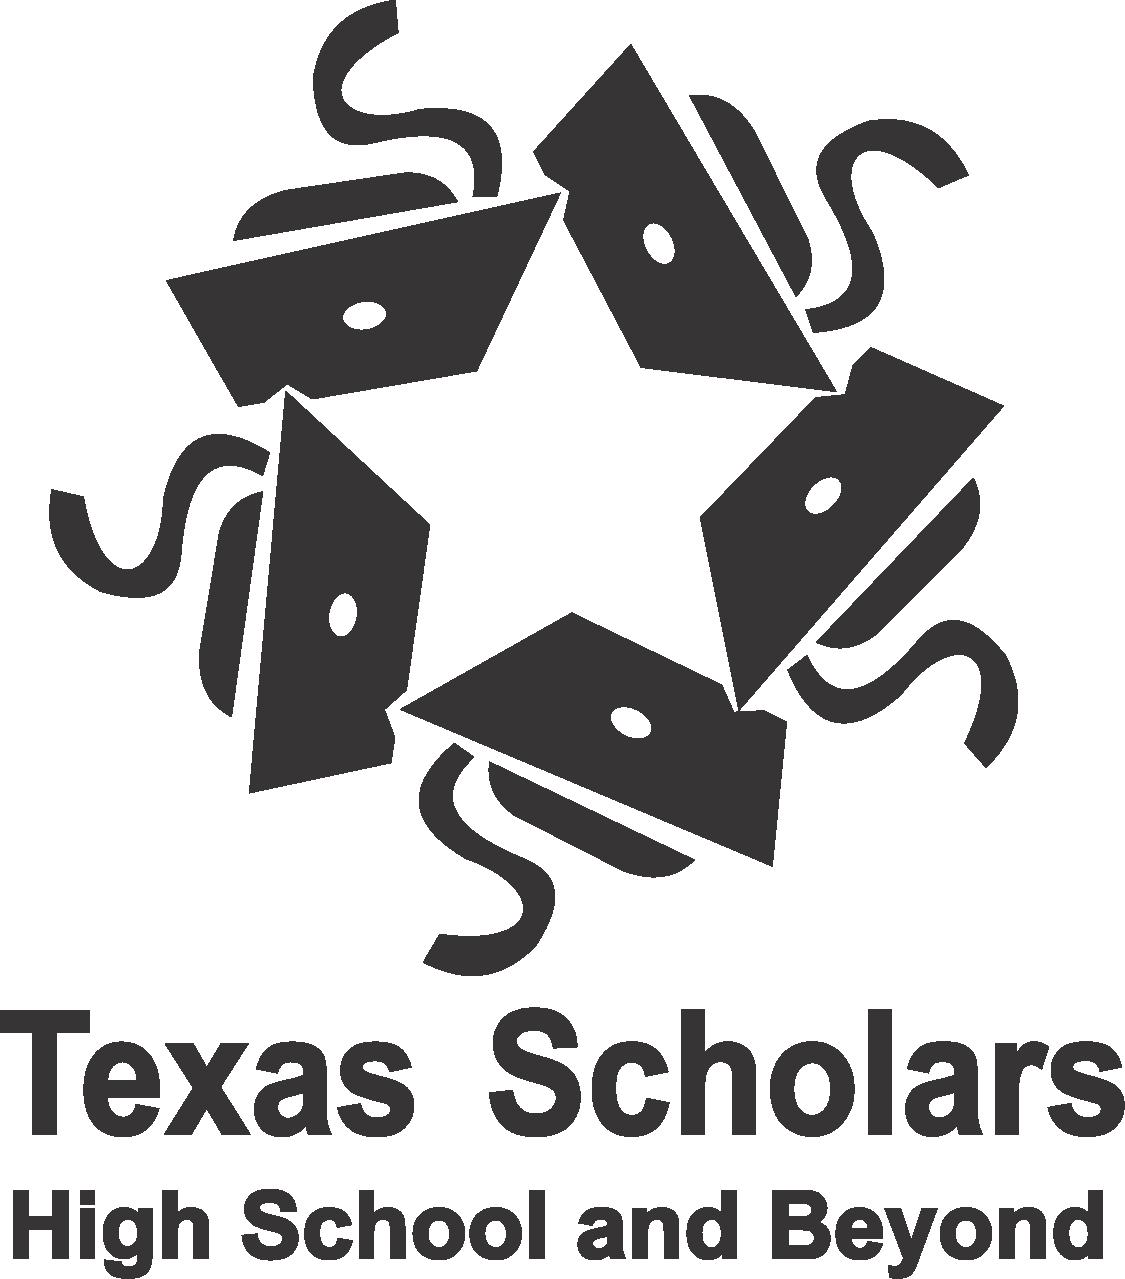 Texas Scholars Official